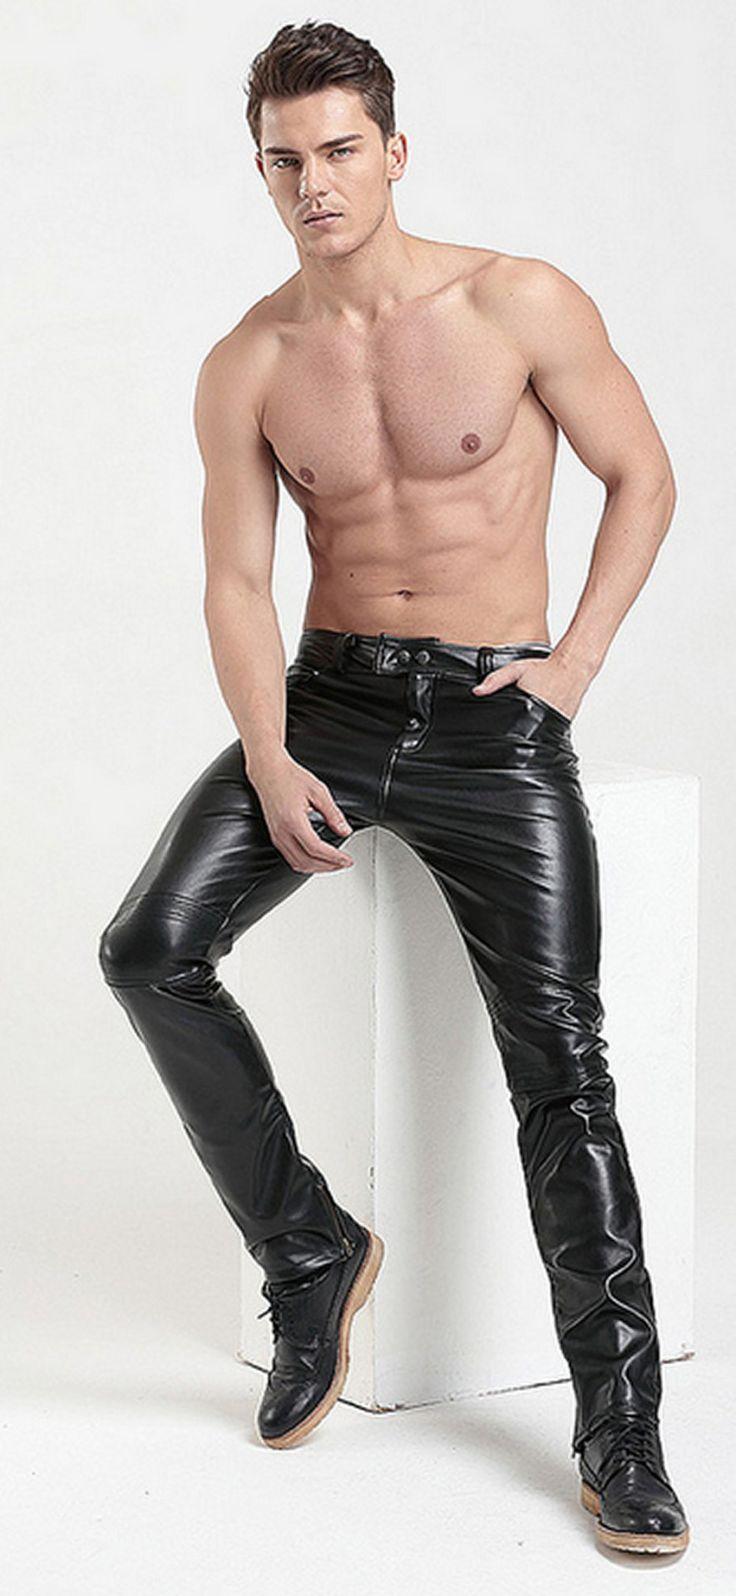 botas gay sexy